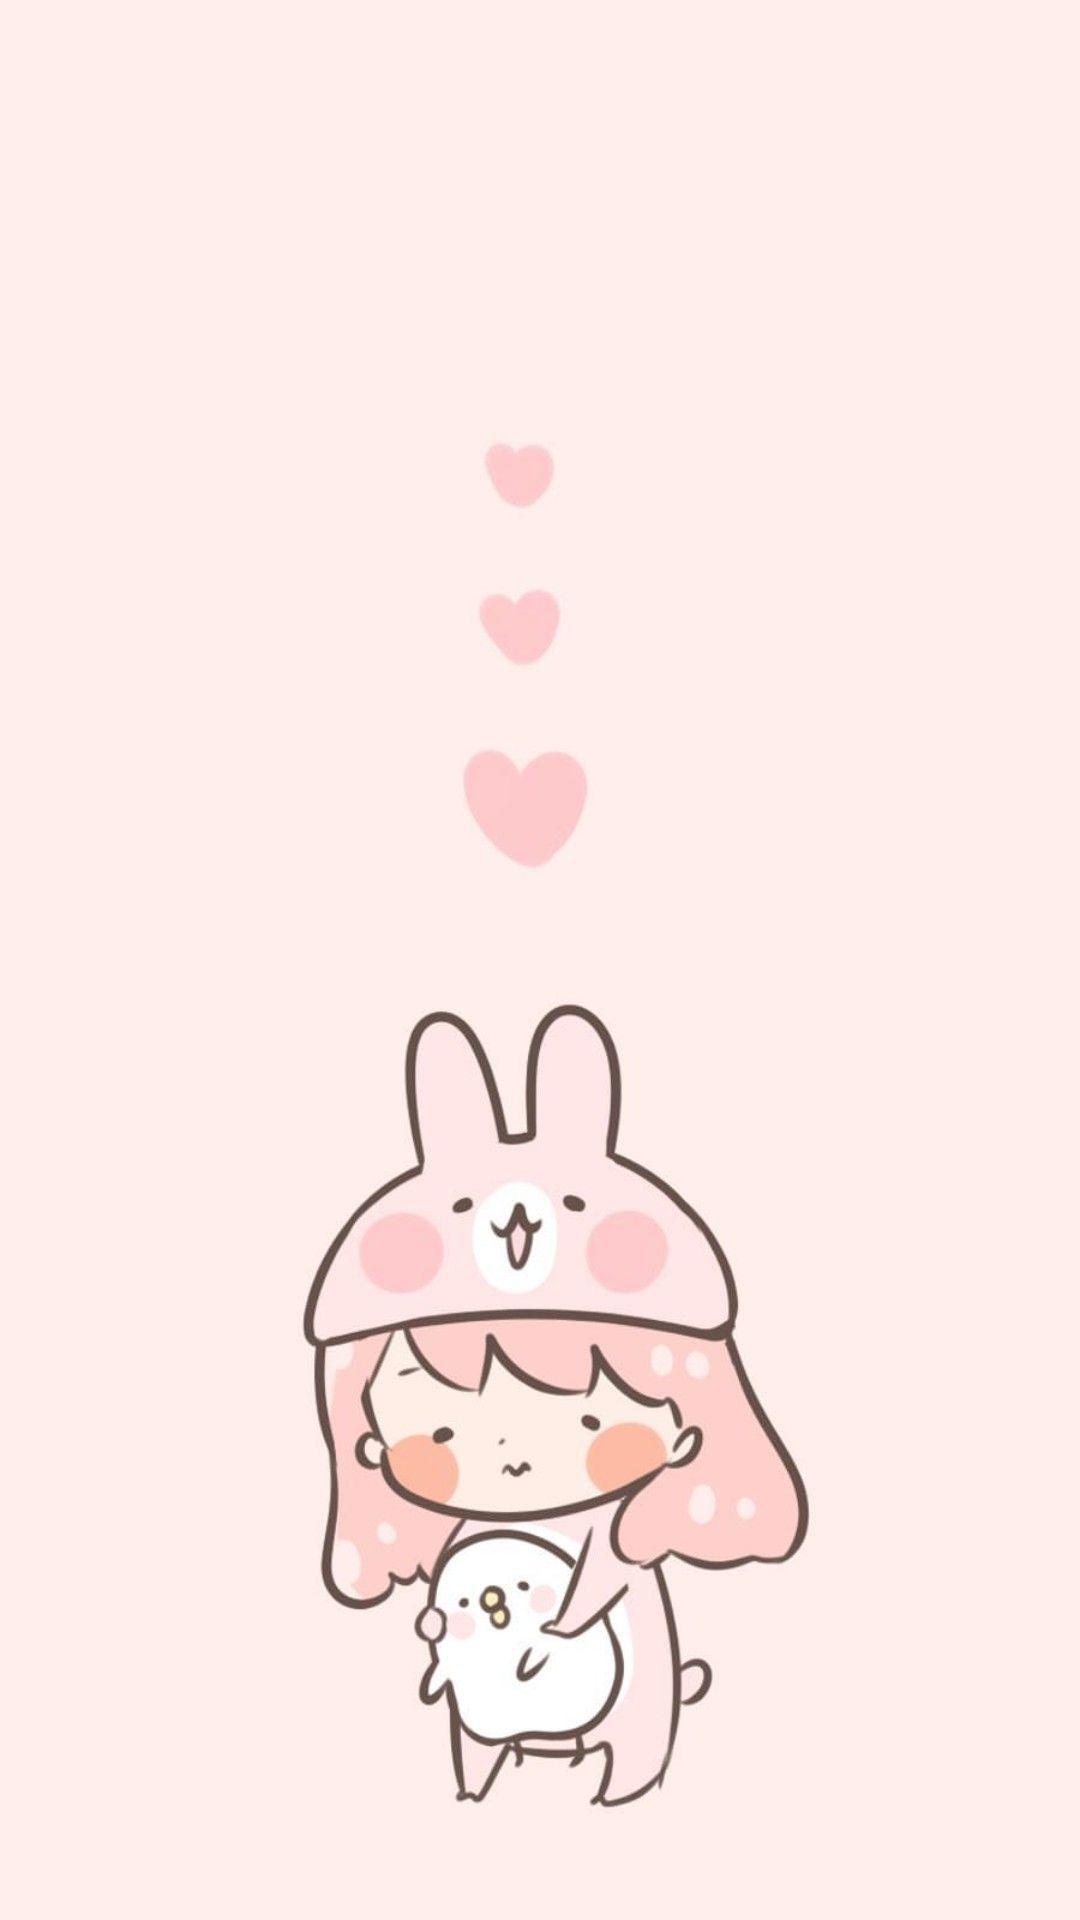 Wallpaper Tumblr Pink Cute Simple Wallpapers Wallpaper Pink Cute Simple Iphone Wallpaper